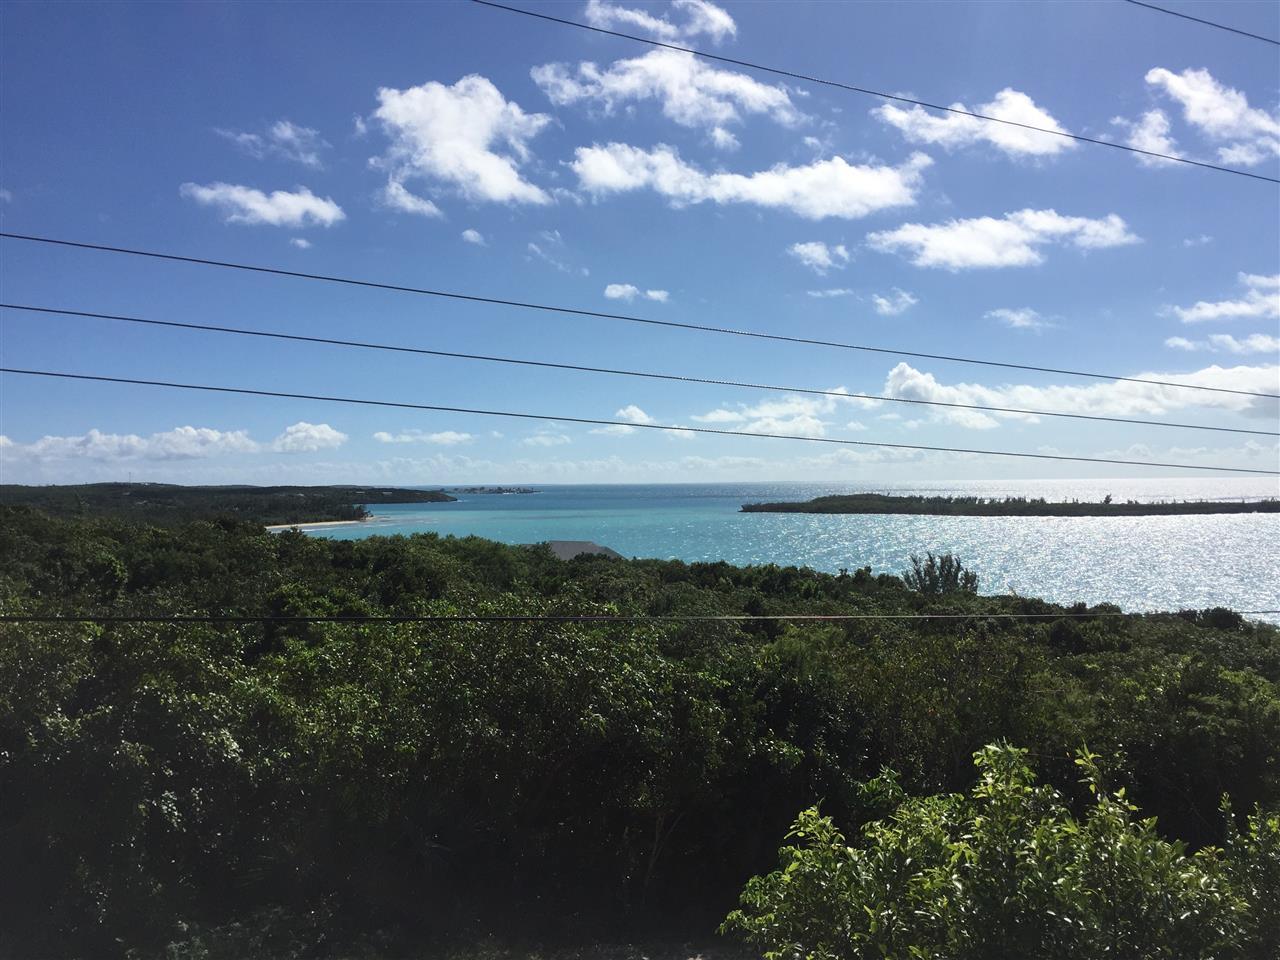 Island hilltop, Nassau, Bahamas